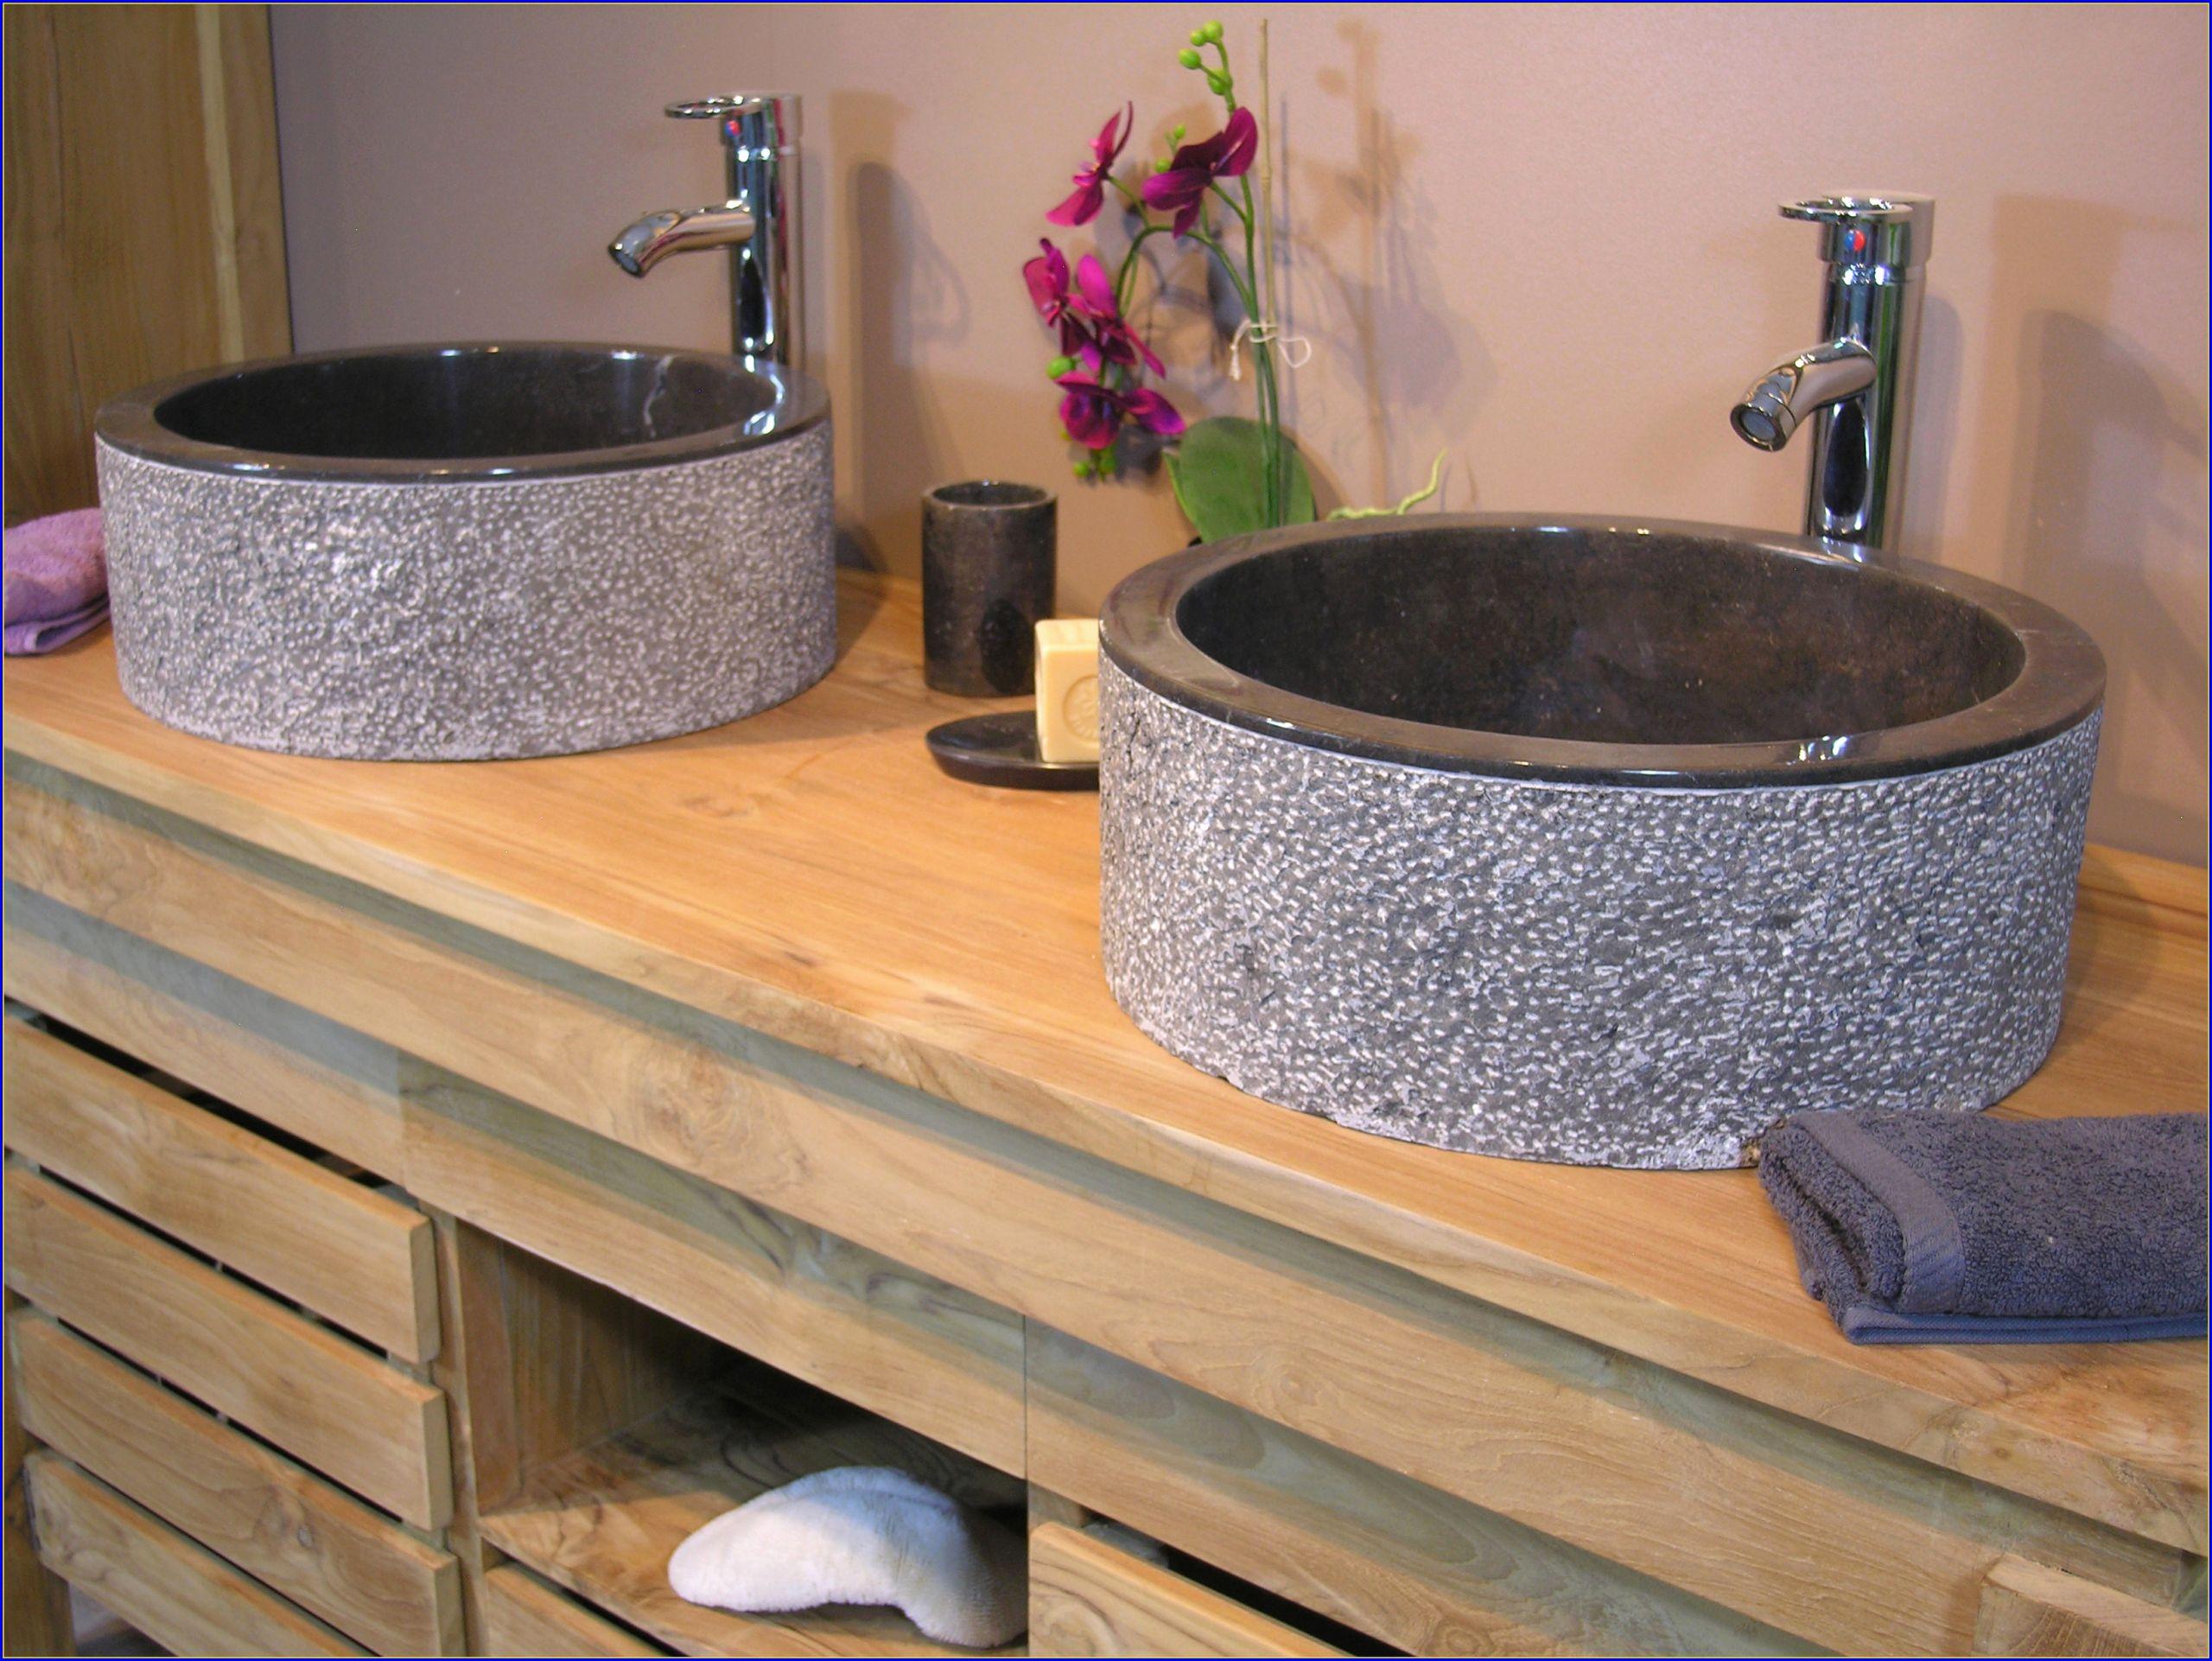 vasque de jardin en pierre elegant vasque en pierre pas cher 16 literarywondrous evier salle de bain en of vasque de jardin en pierre